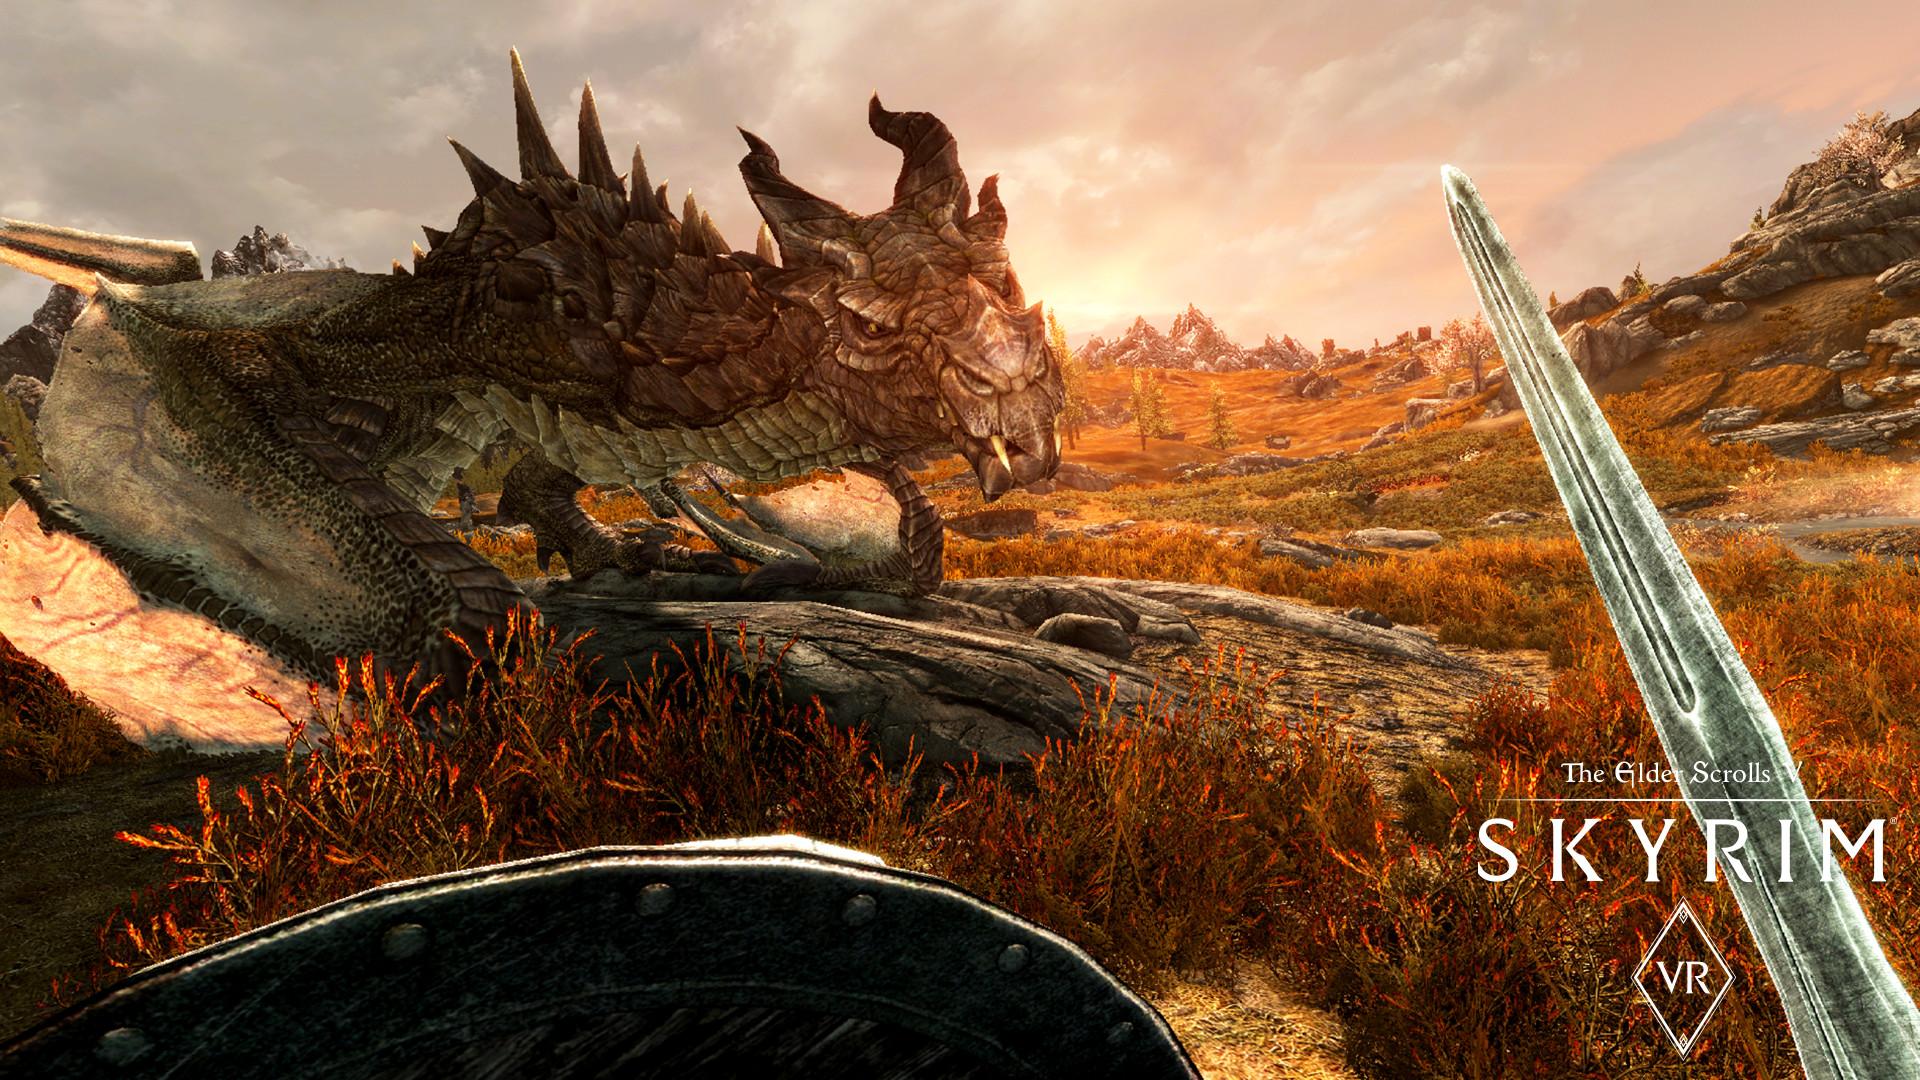 The Elder Scrolls V: Skyrim (VR)